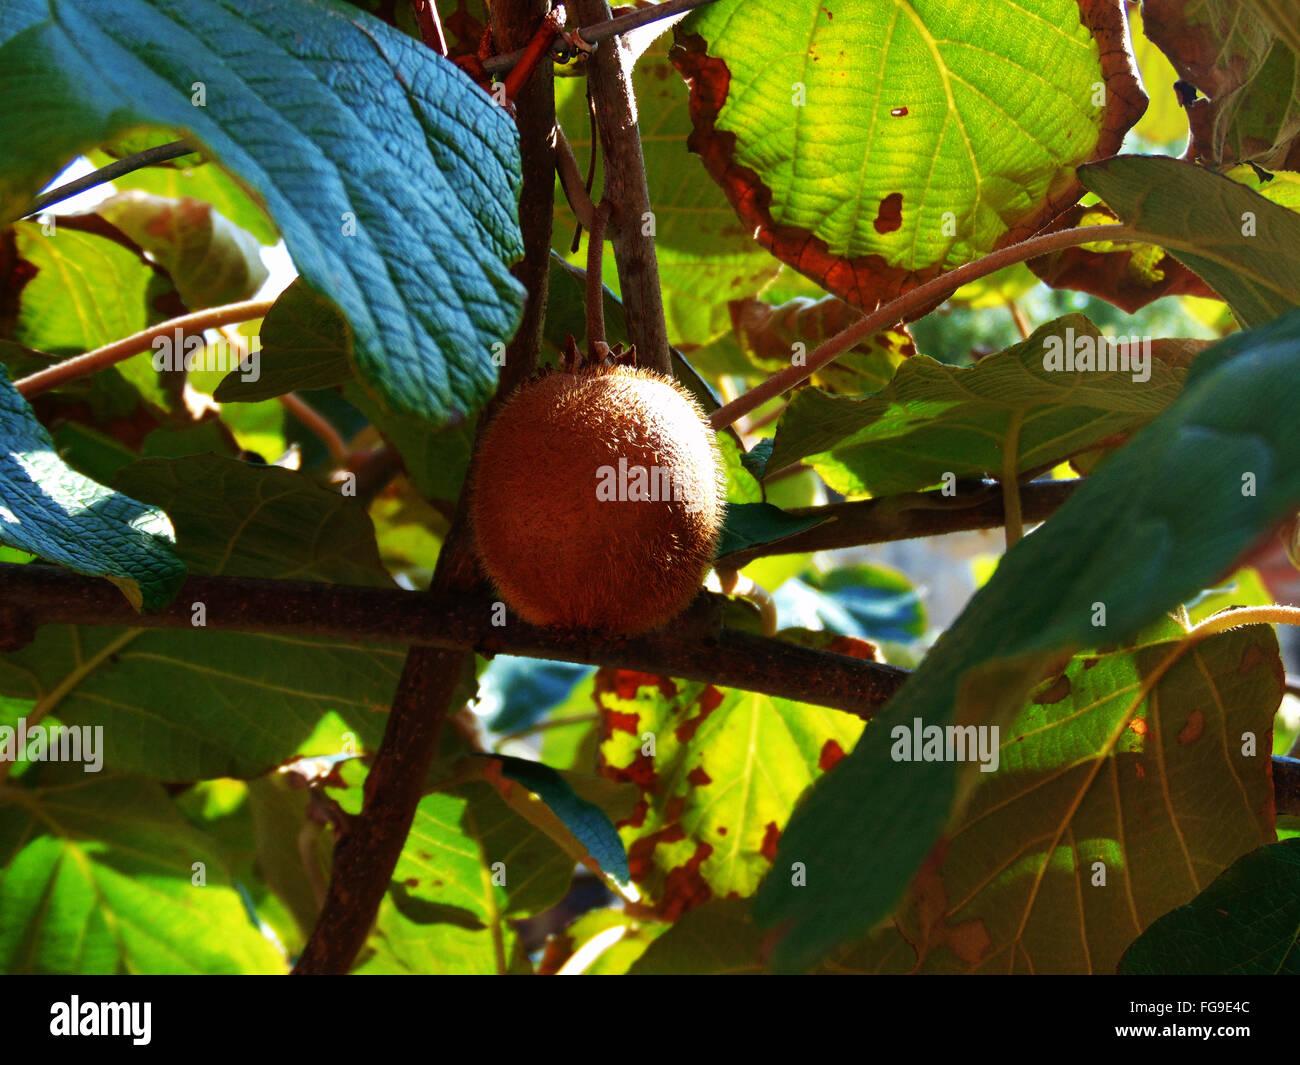 Low Angle View Of Kiwi Growing On Plant - Stock Image